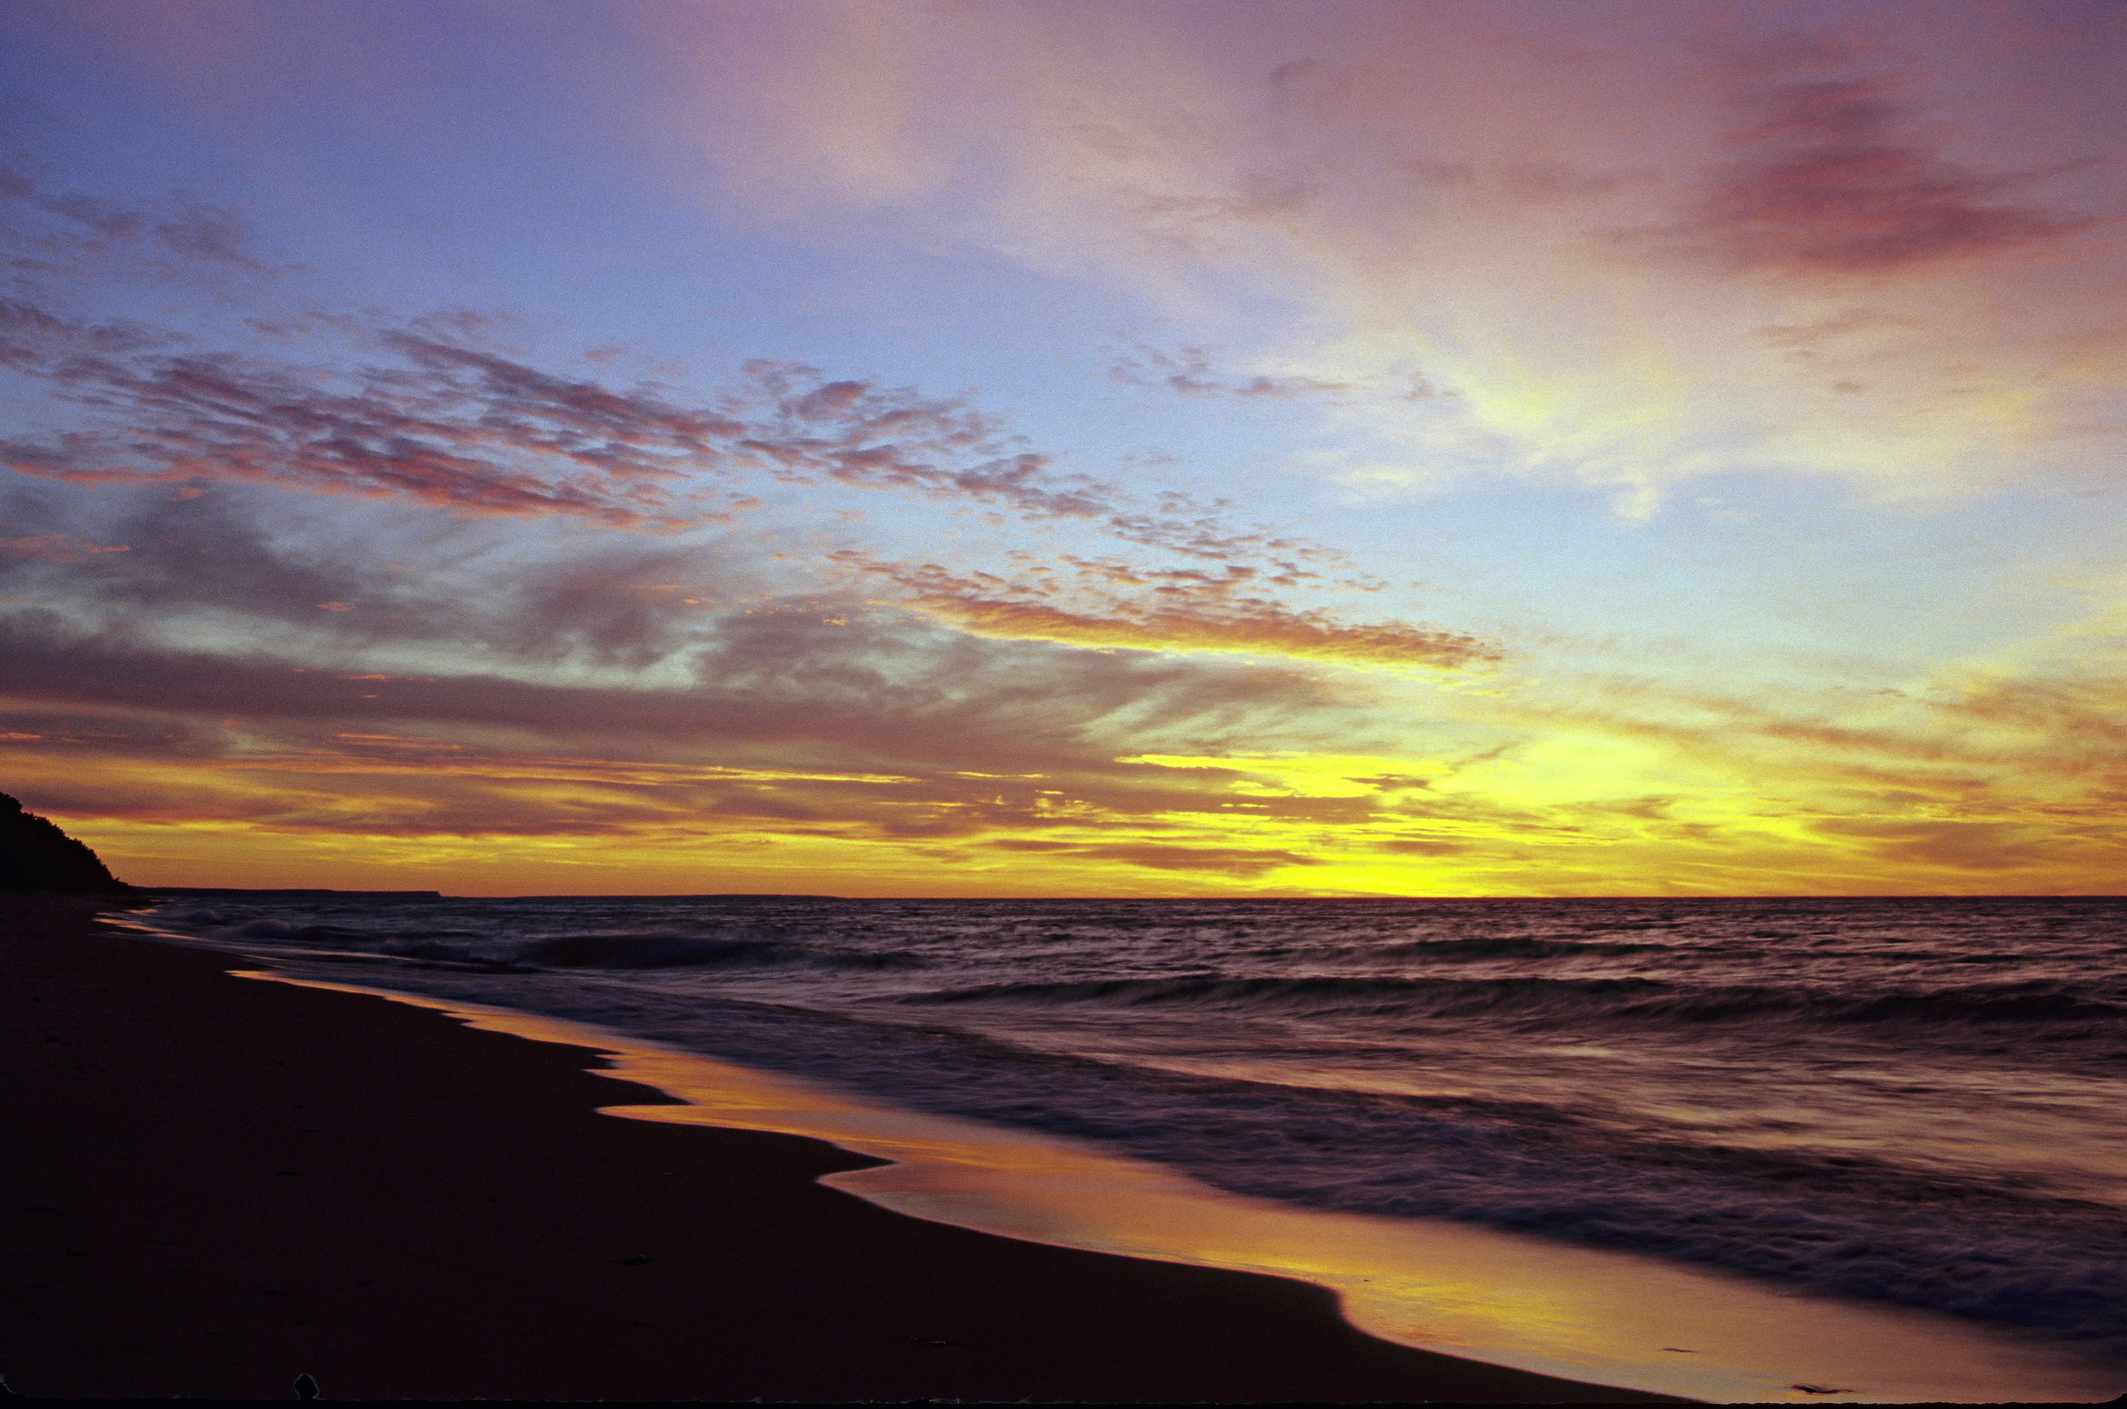 Pictured Rocks National Lakeshore, Lake Superior, Twelve Mile Beach. Michigan's Upper Peninsula